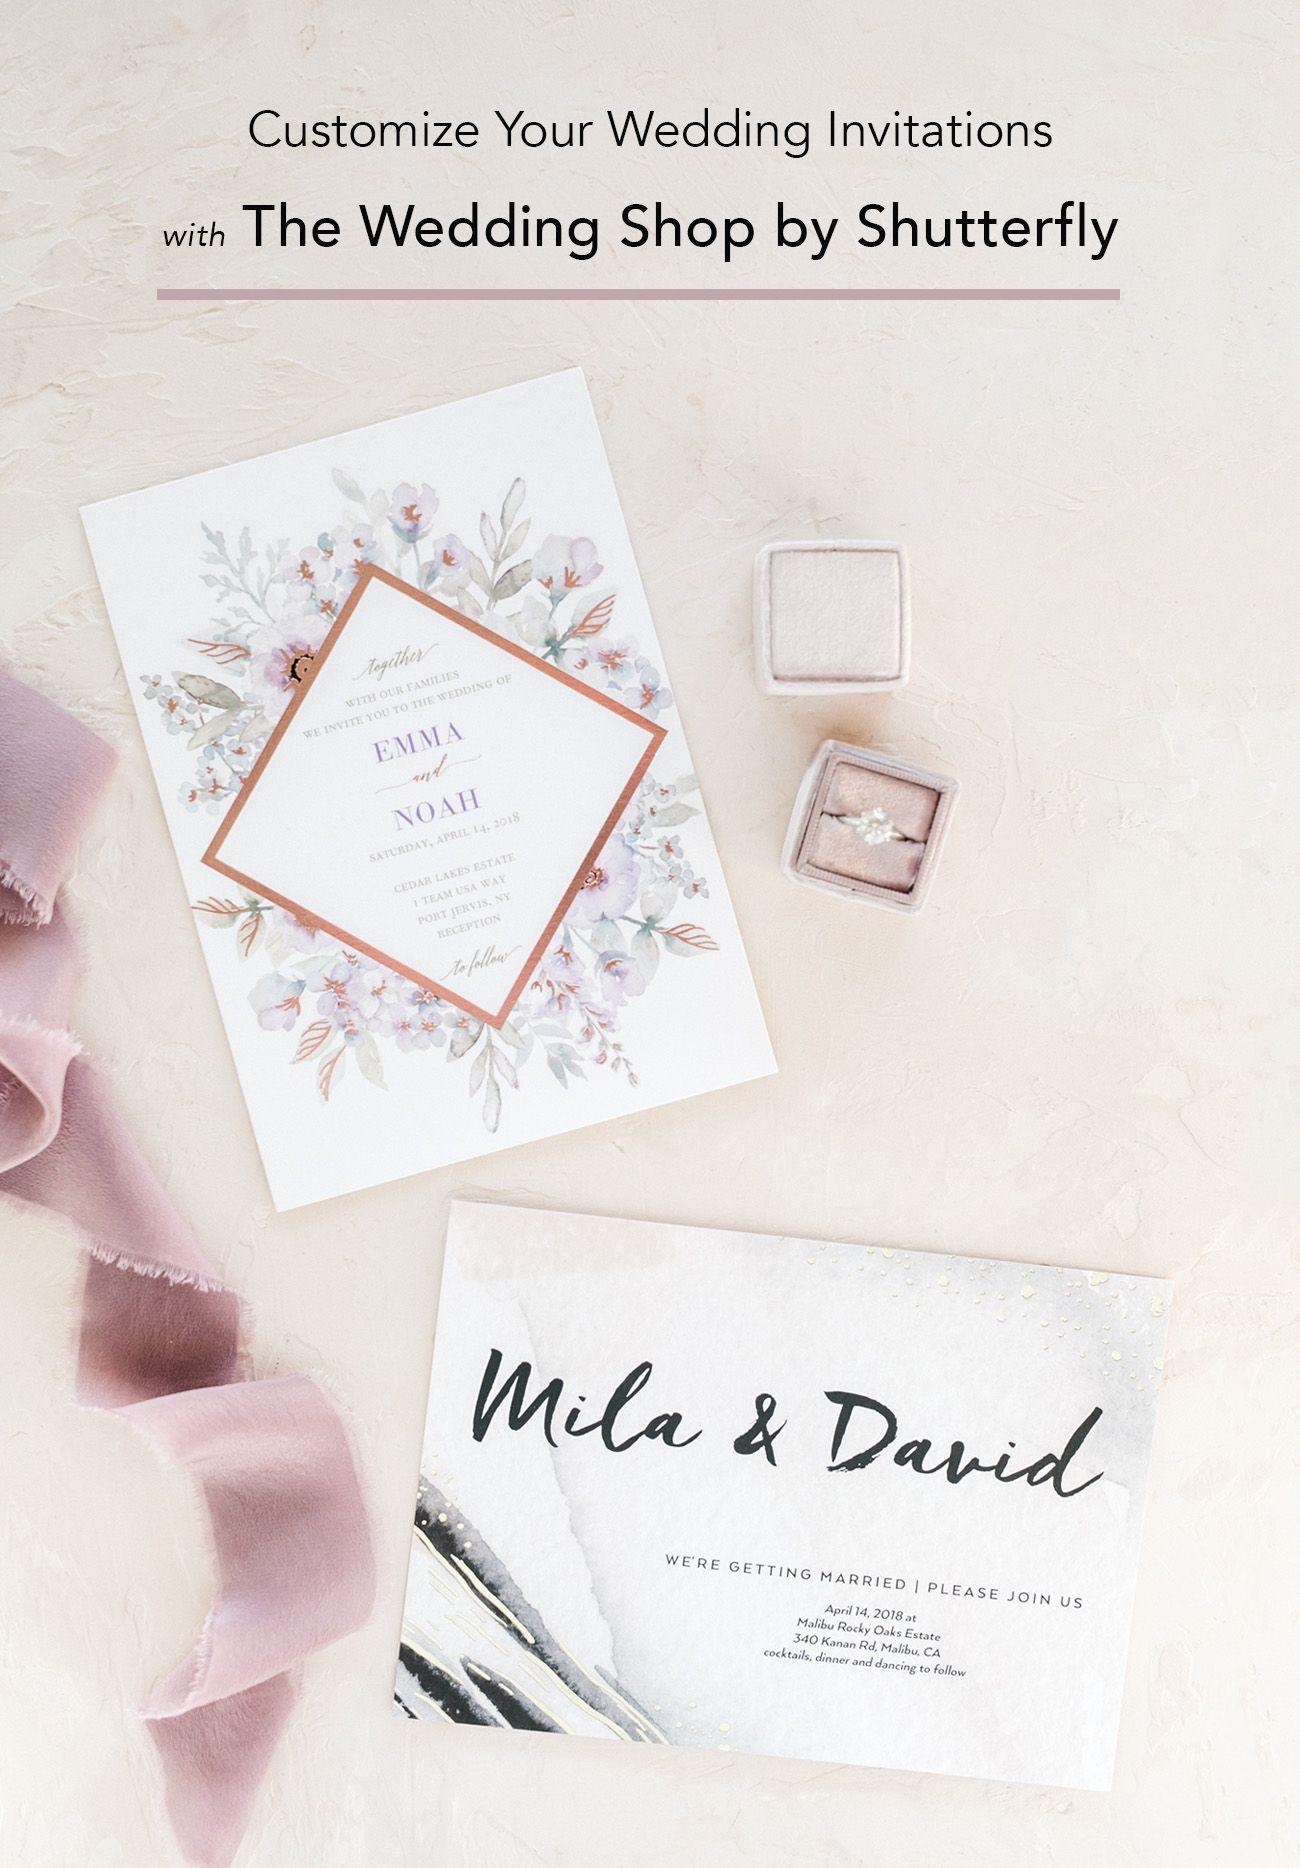 Custom Wedding Invitations with The Wedding Shop by